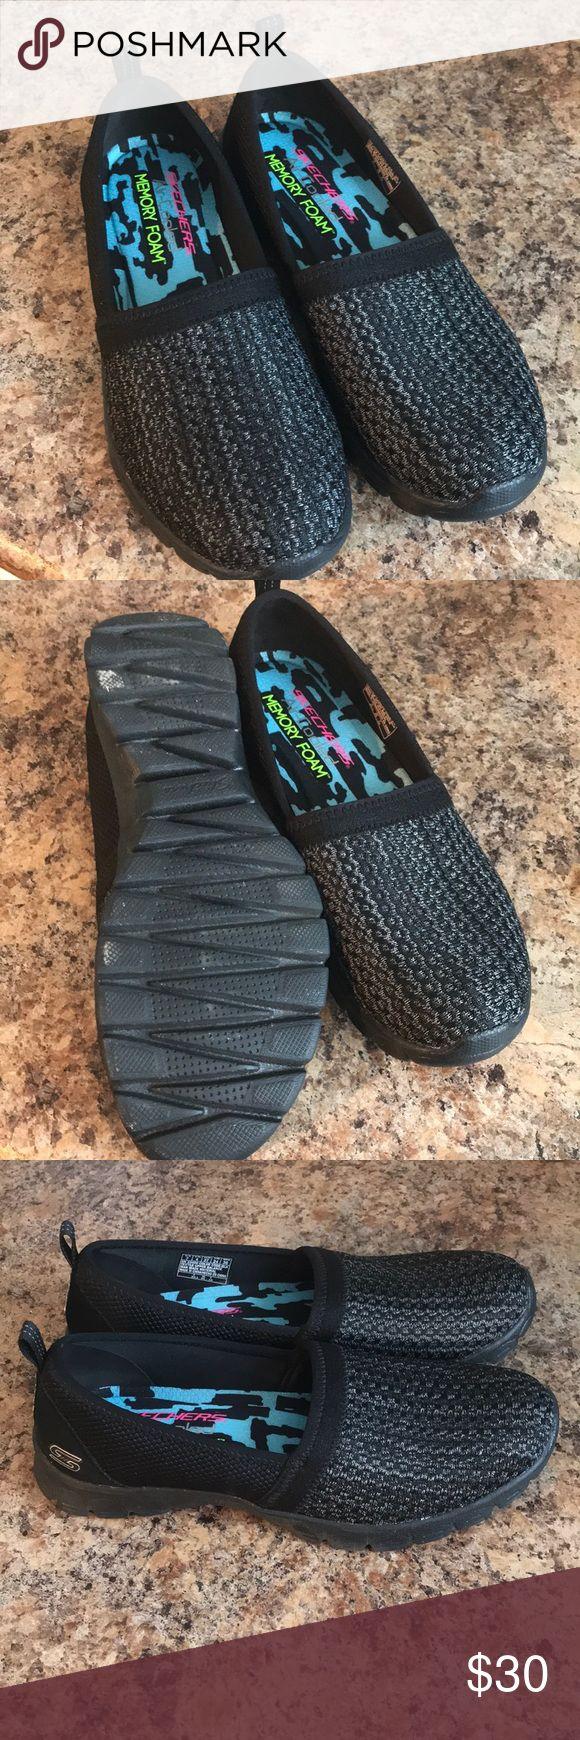 Skechers AirCooled slip on Skechers, Memory foam shoes